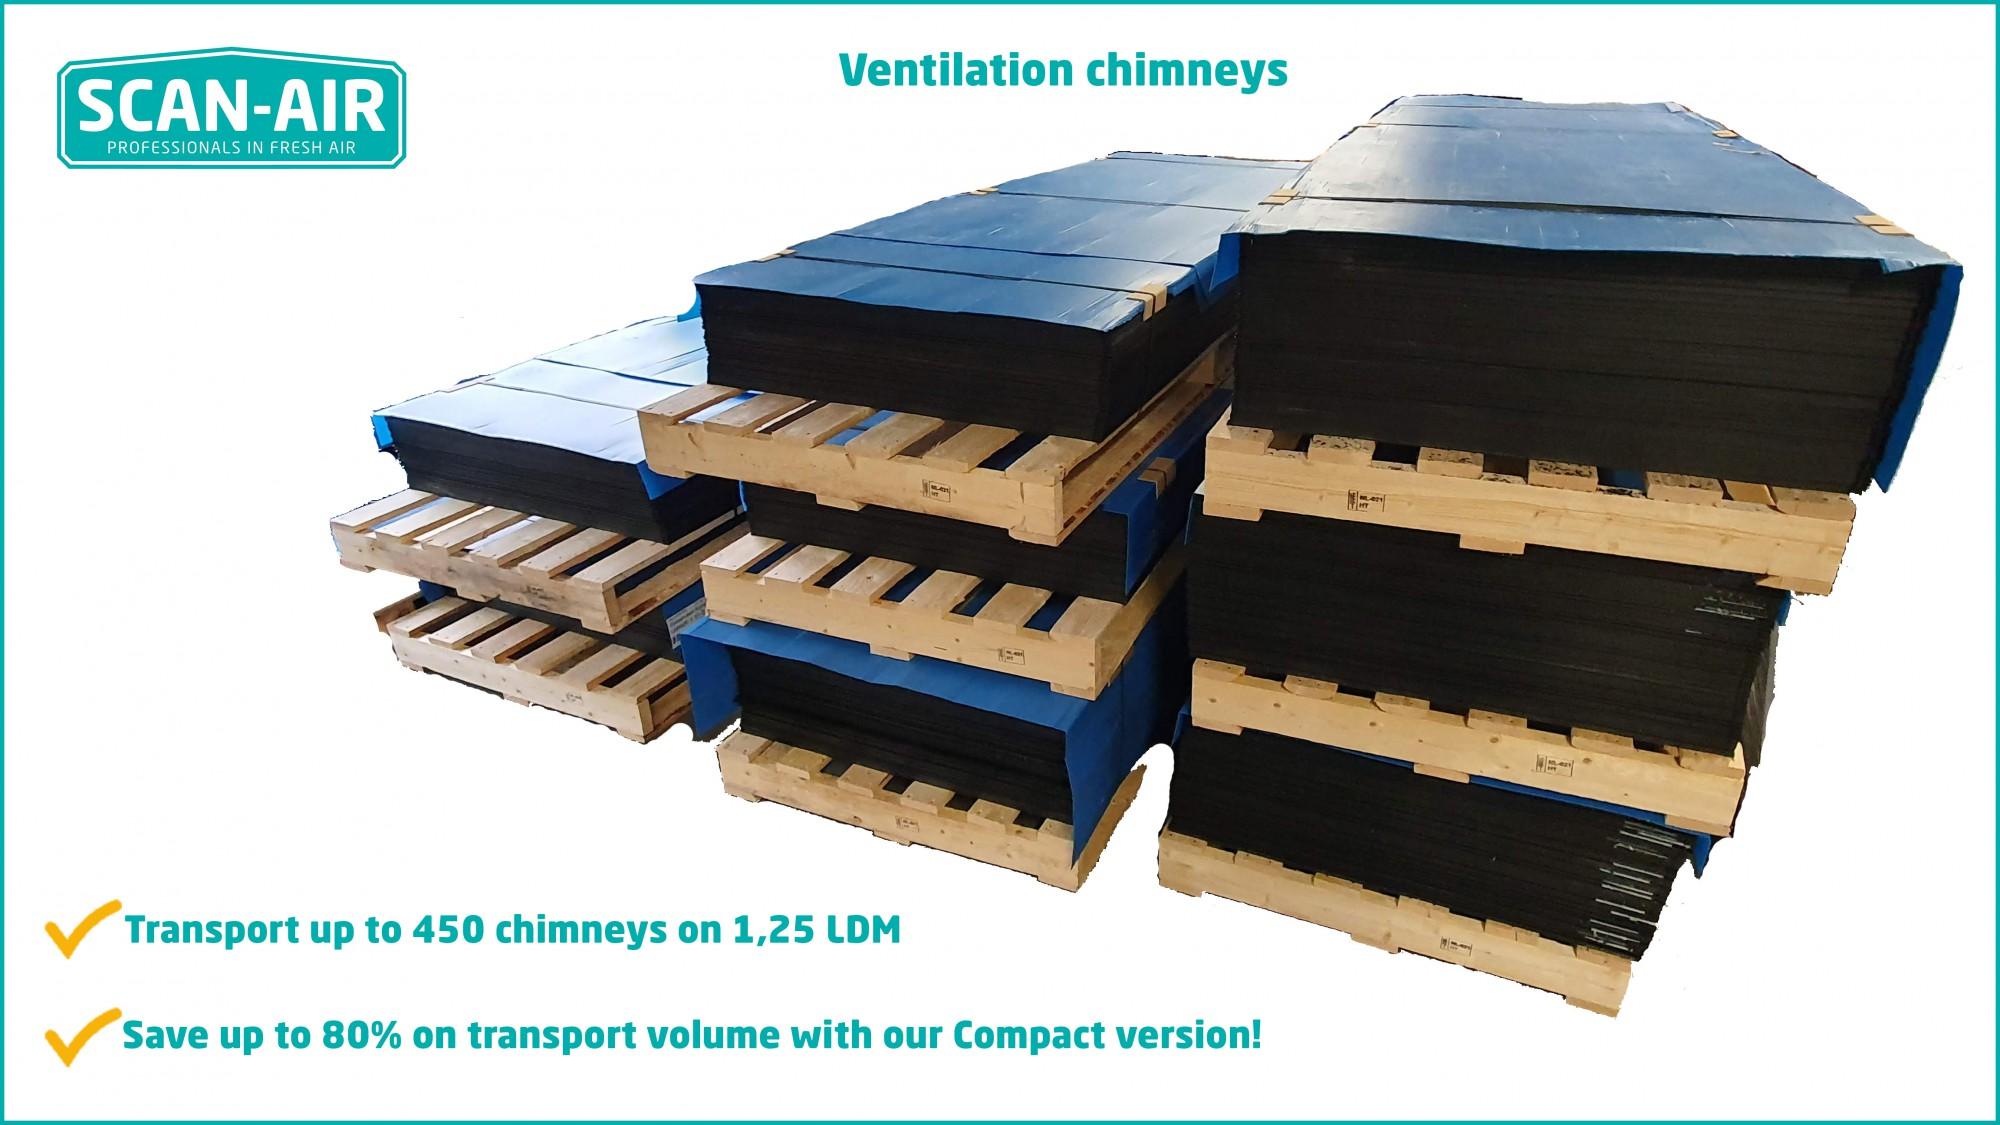 ventilation chimneys compact version scan air